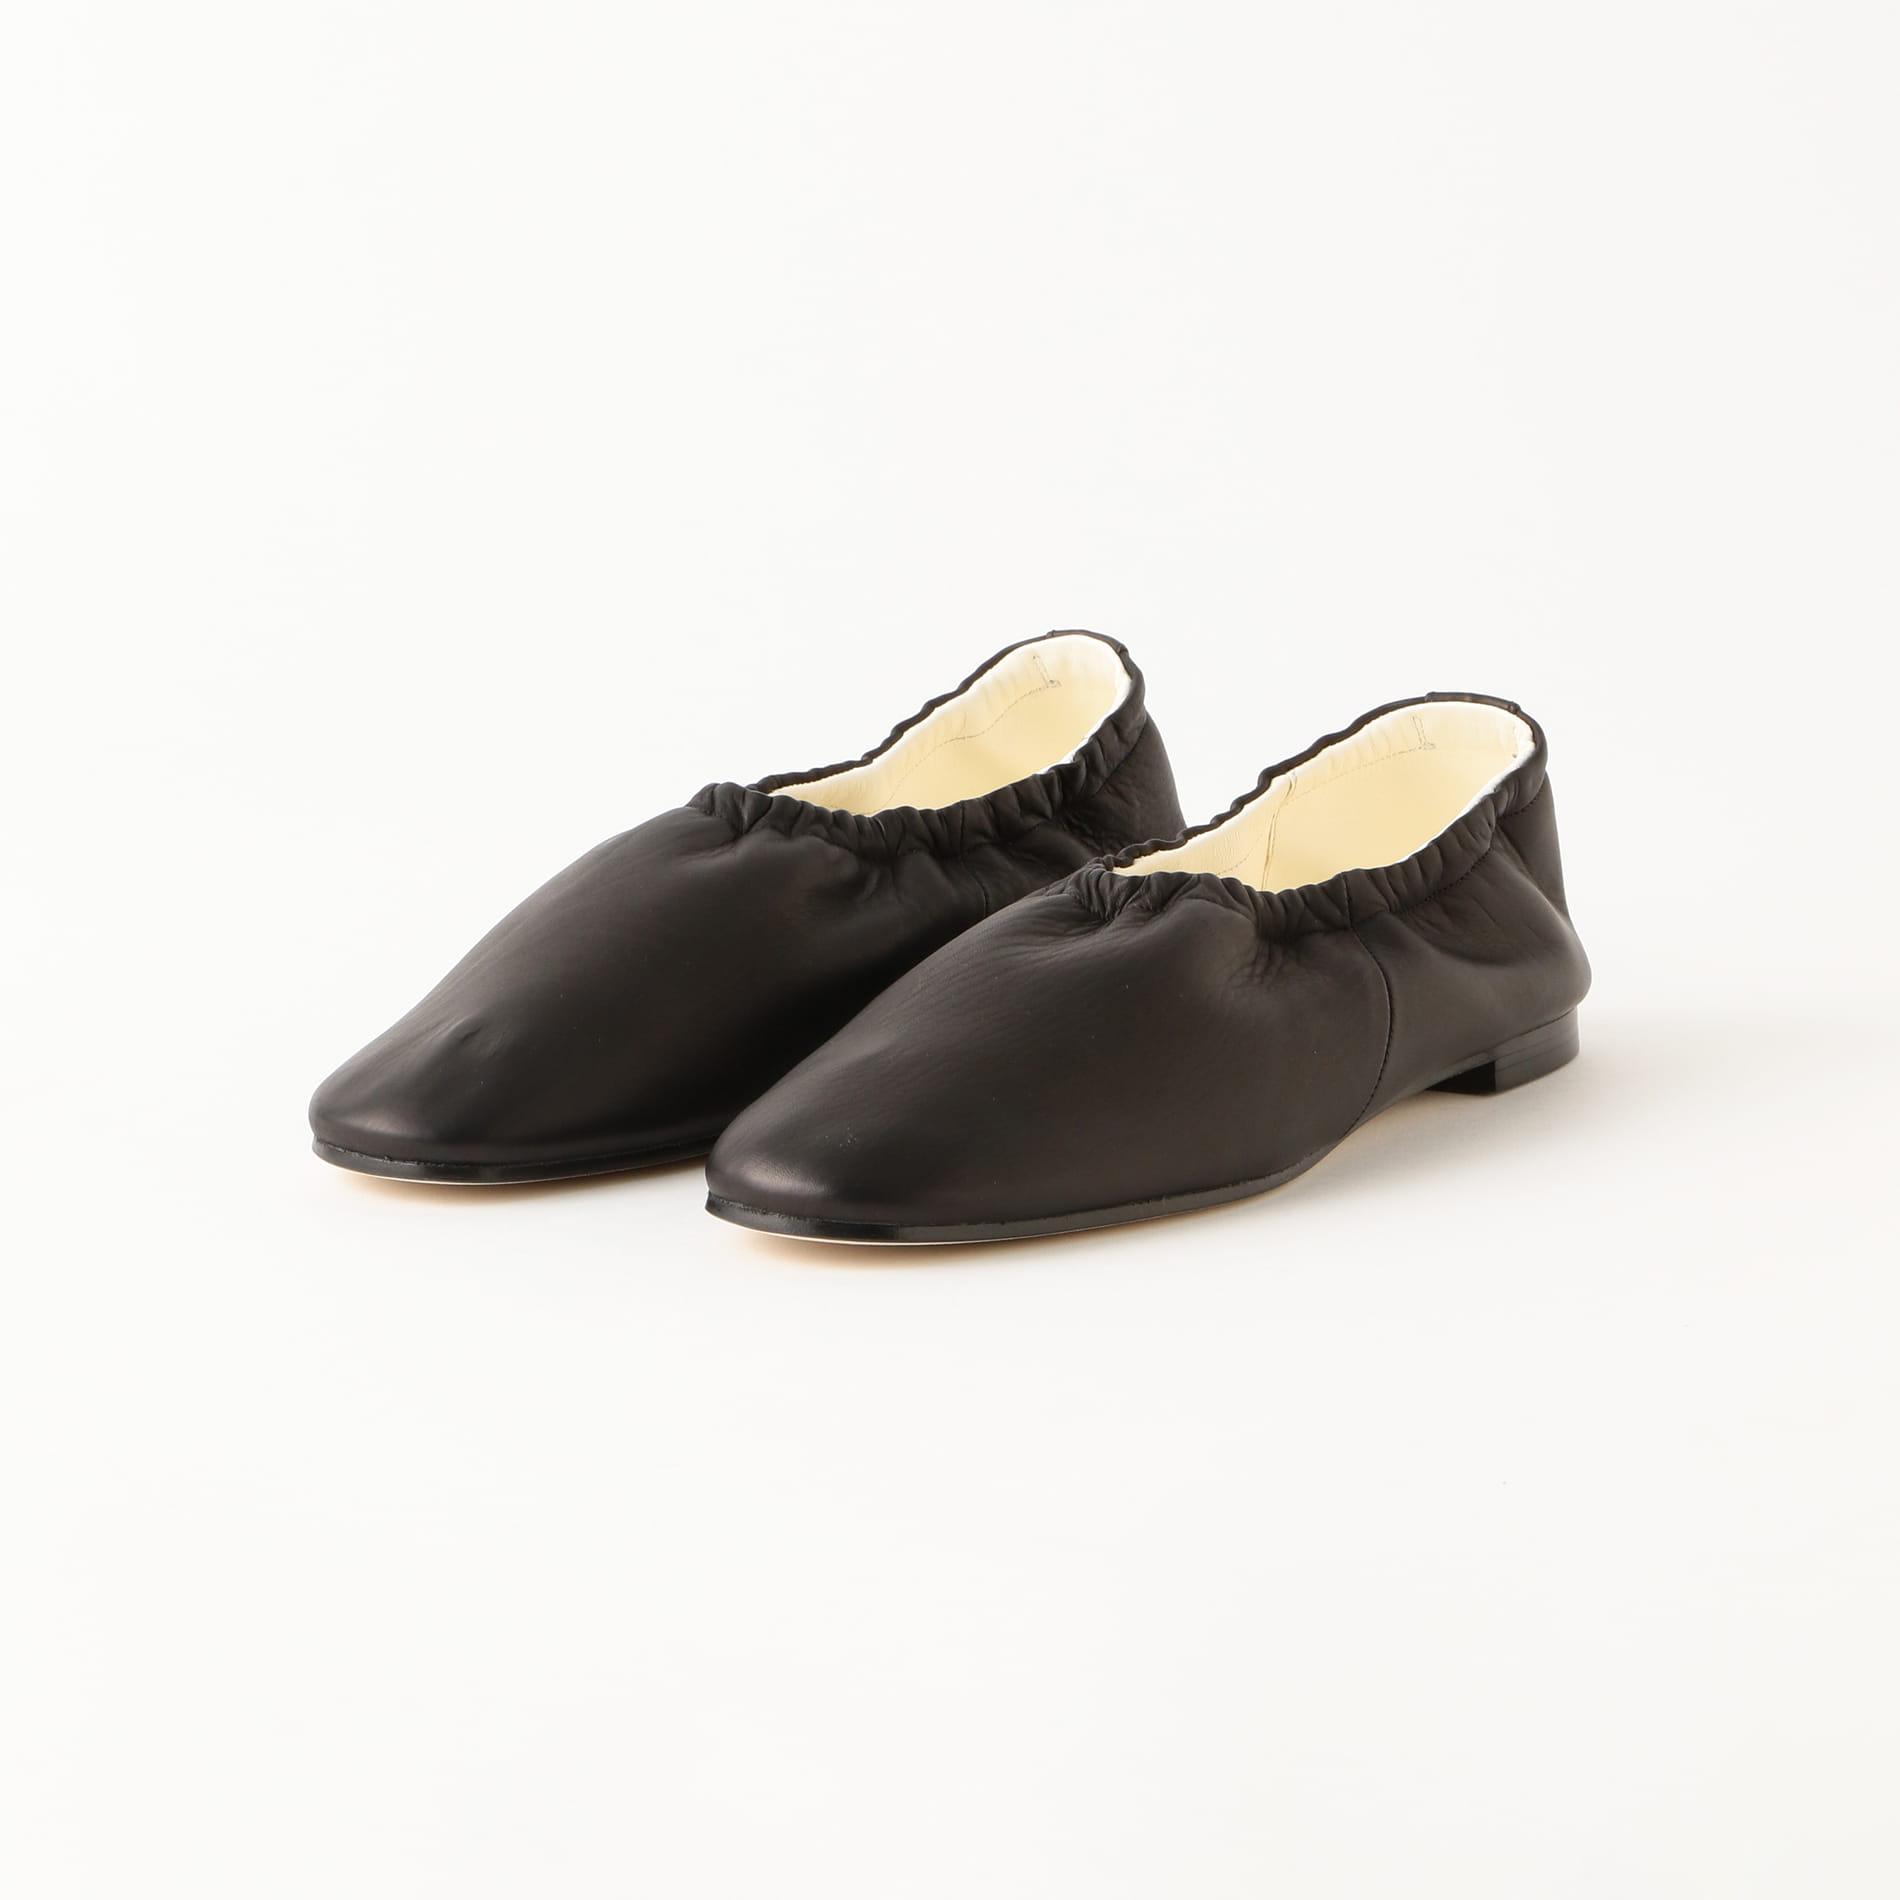 【BEAUTIFUL SHOES】WOMEN BALLETSHOES BSS1712012